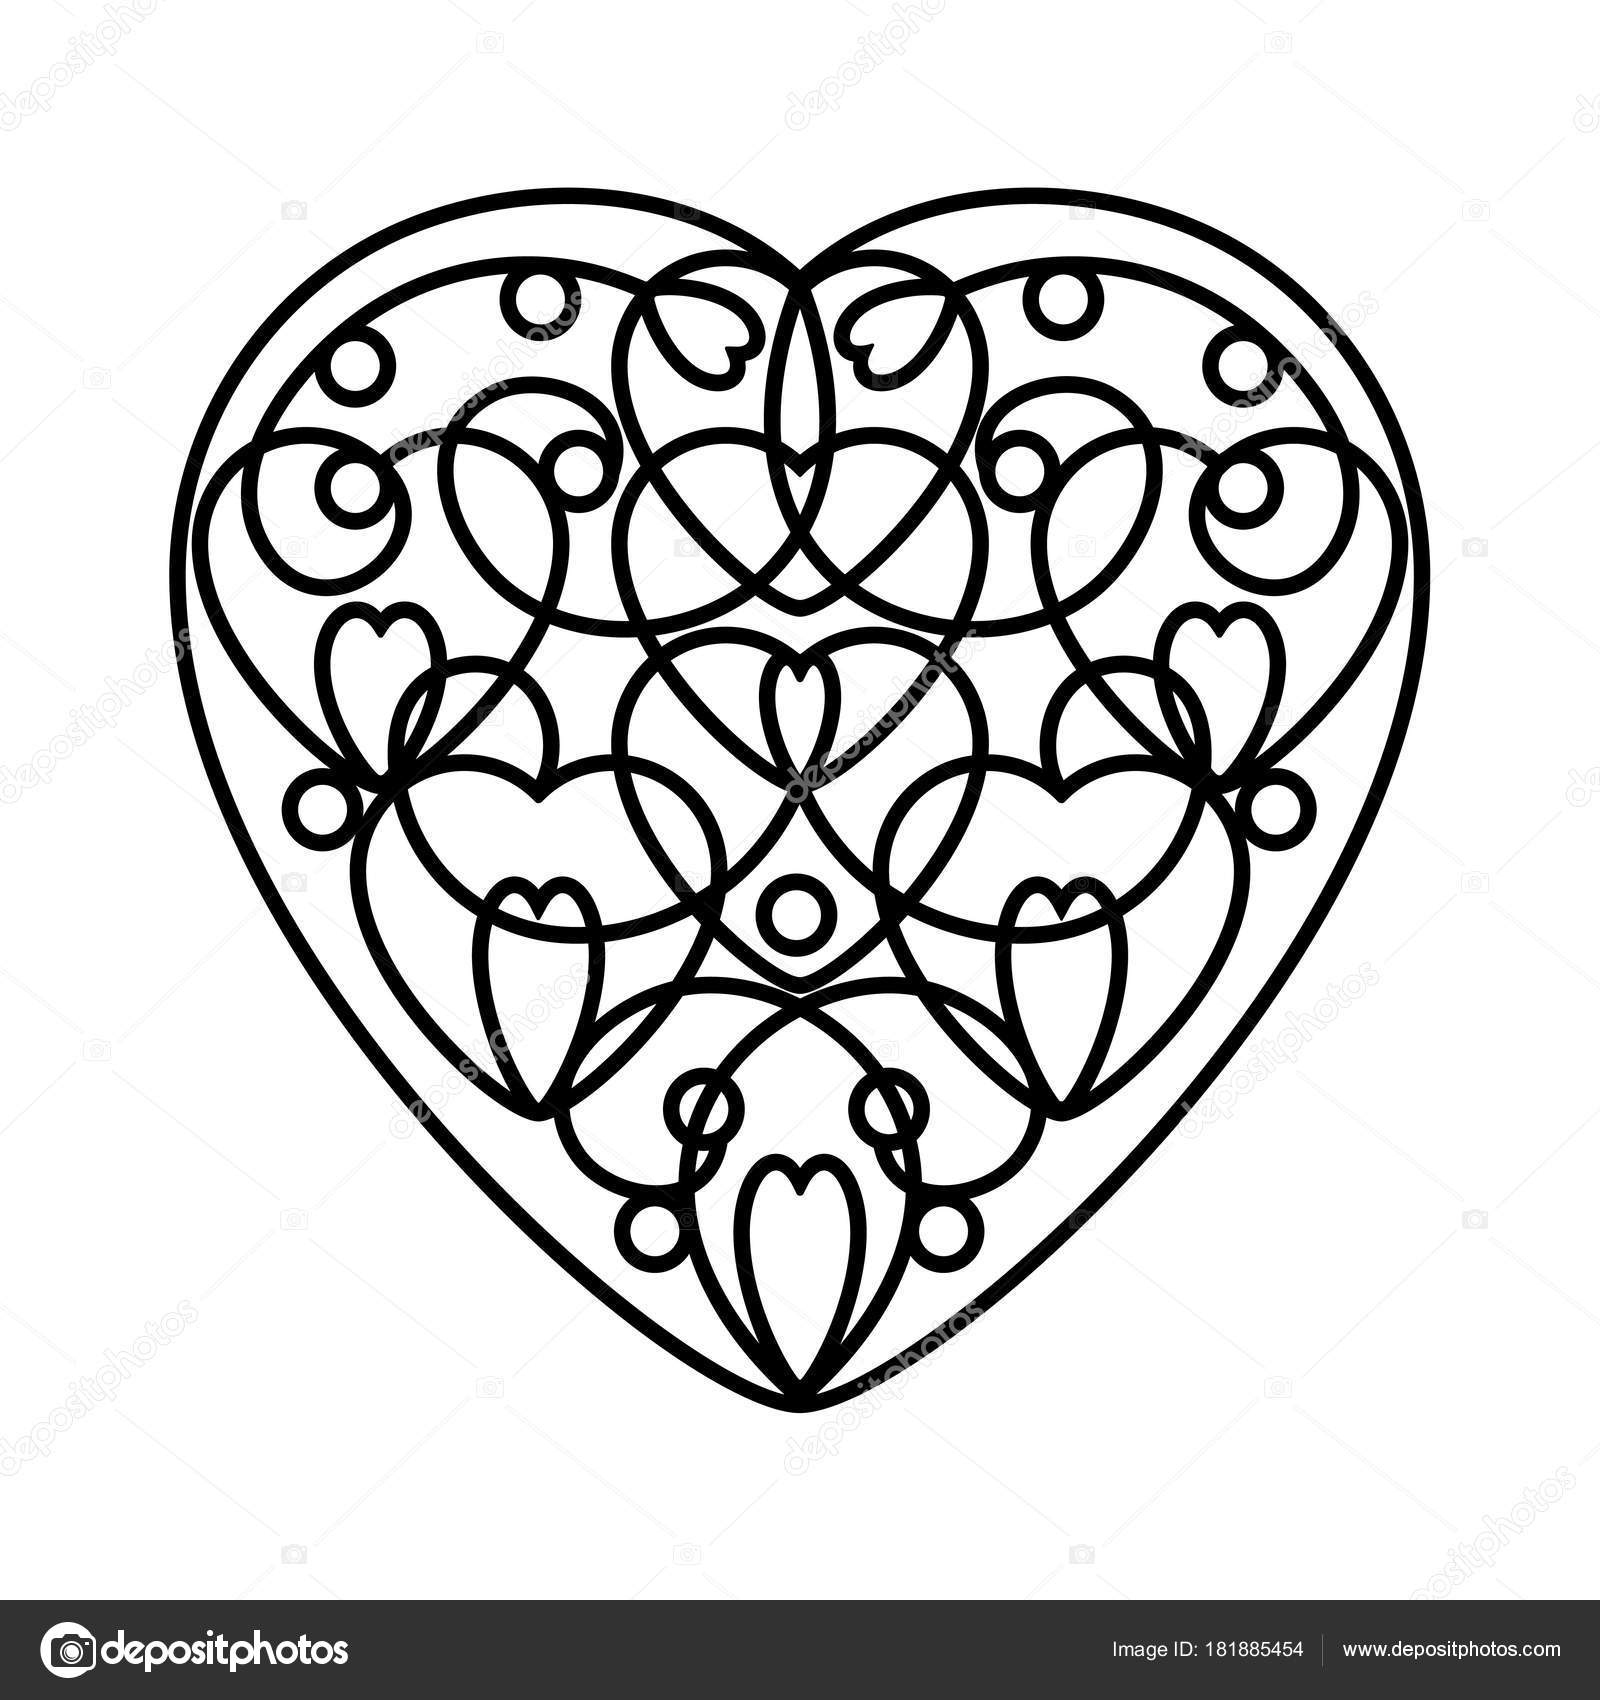 1600x1700 Contour Heart Contours Small Hearts Hand Draw Doodle Black White